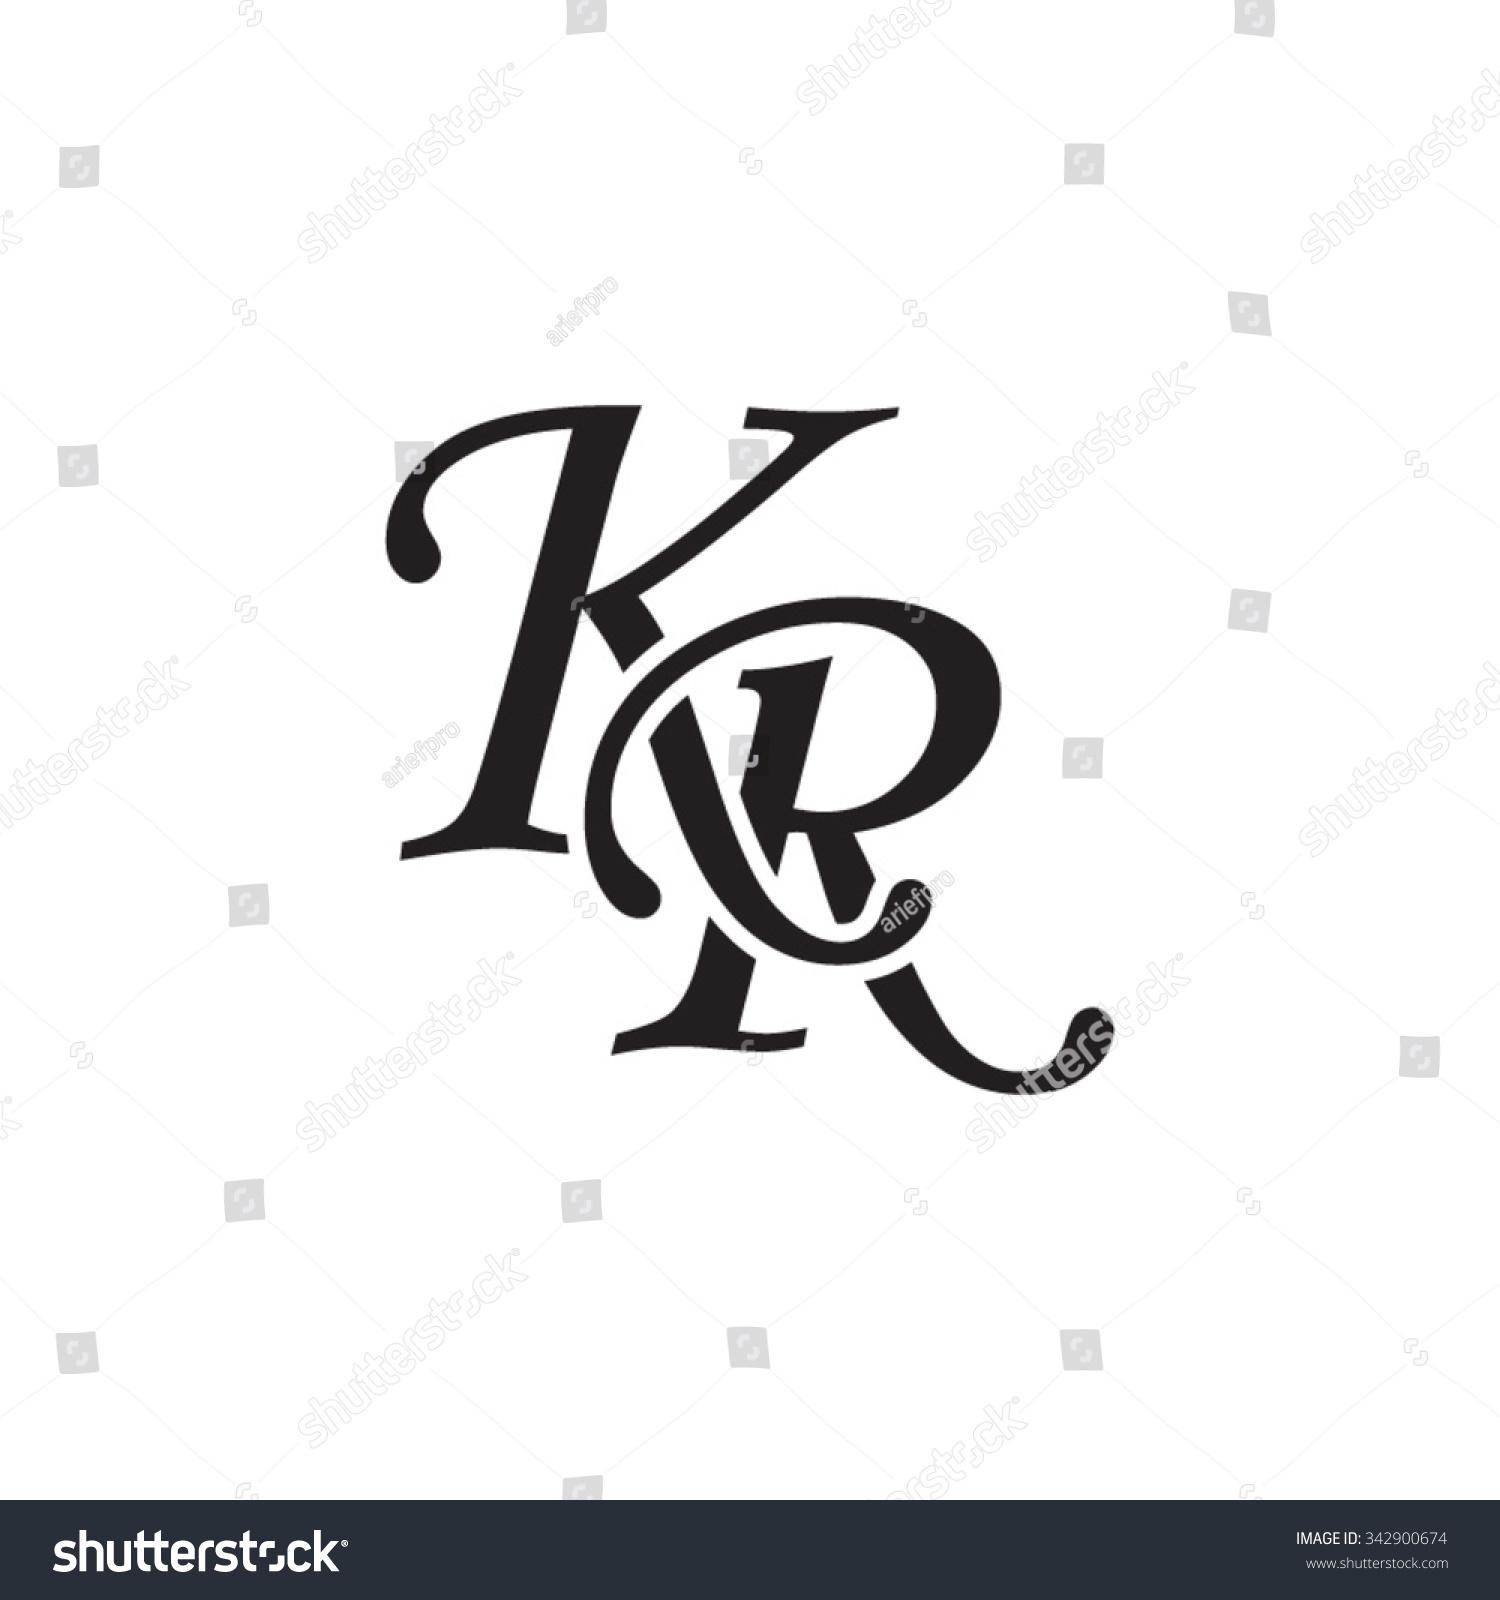 Kr Initial Monogram Logo